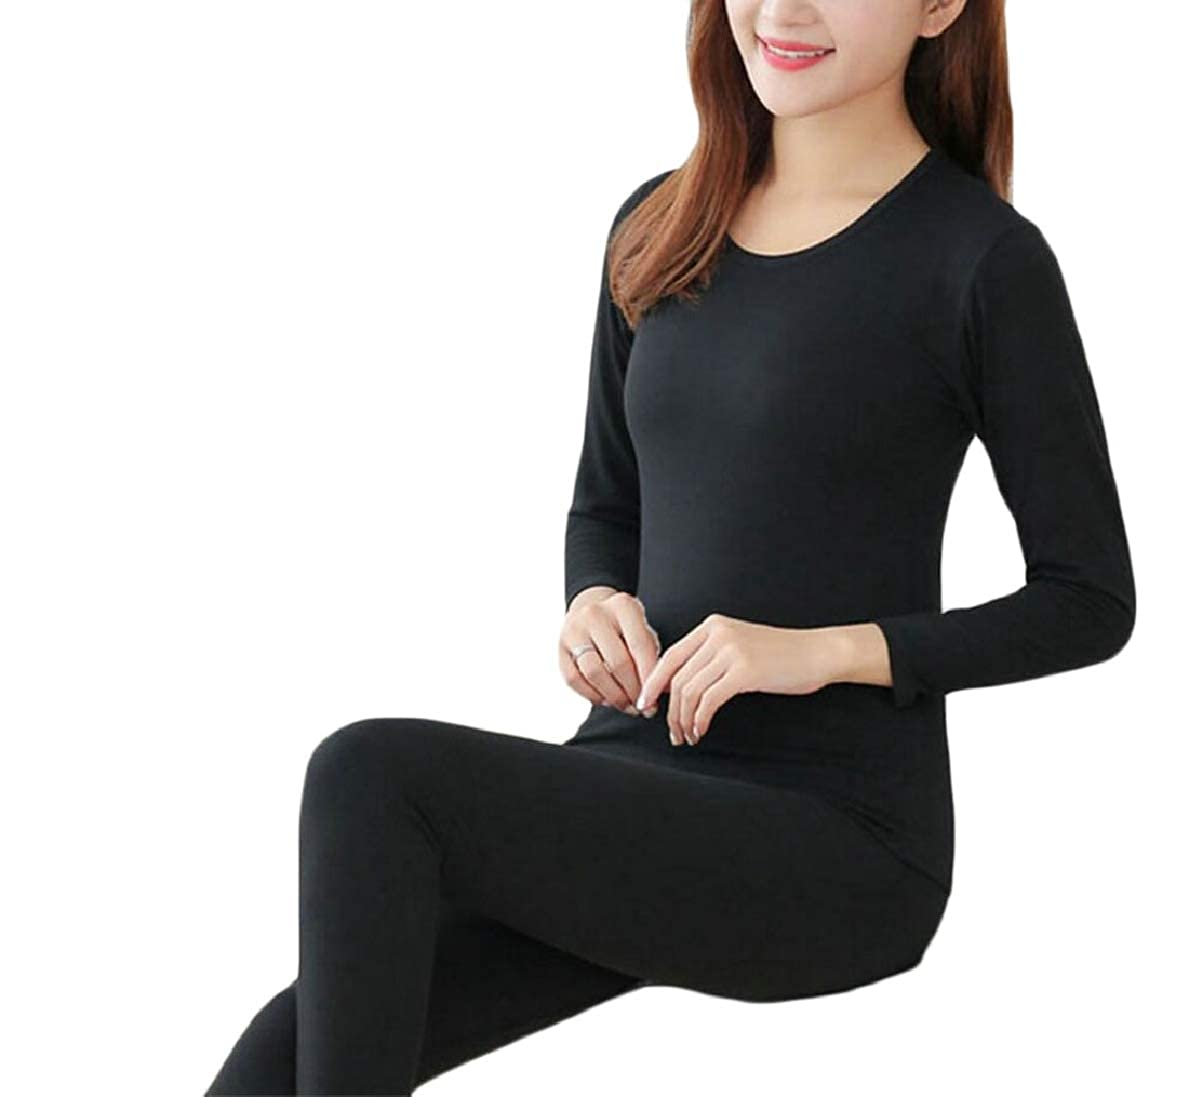 FLCH+YIGE Womens Basic Seamless Round Neck Top /& Bottom Thermal Underwear Sets